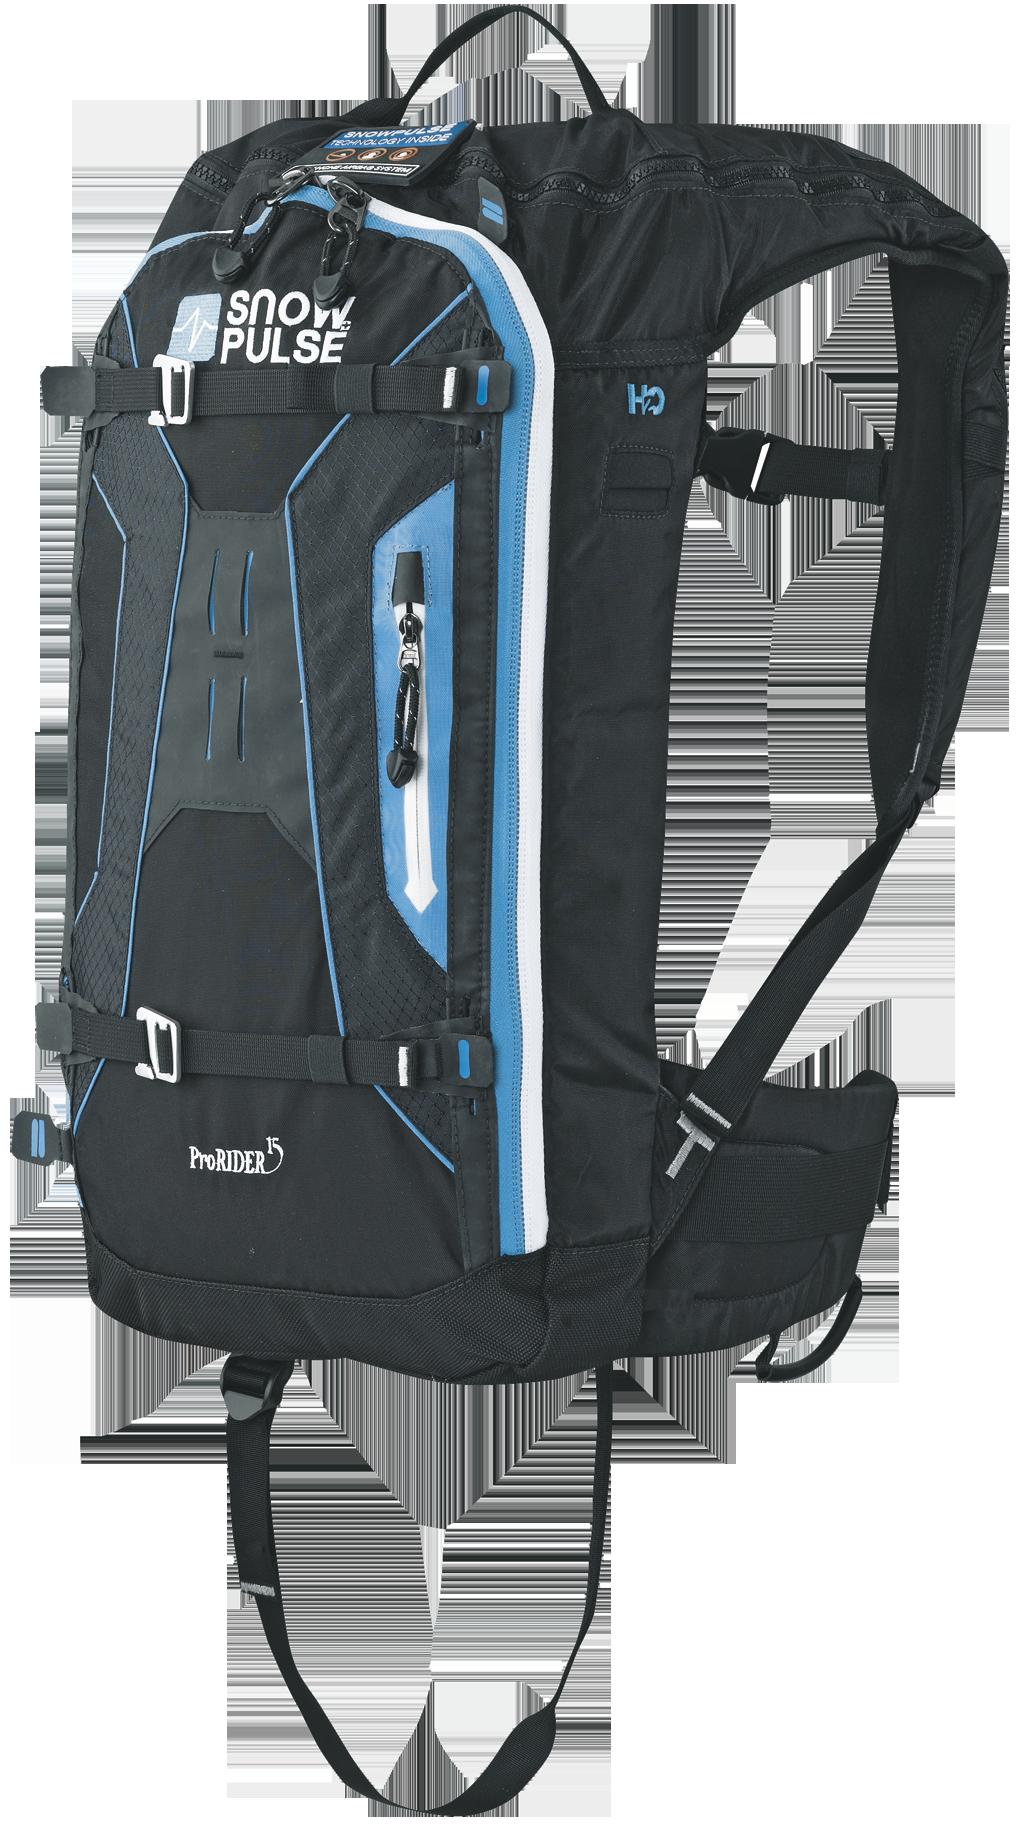 Snowpulse pack